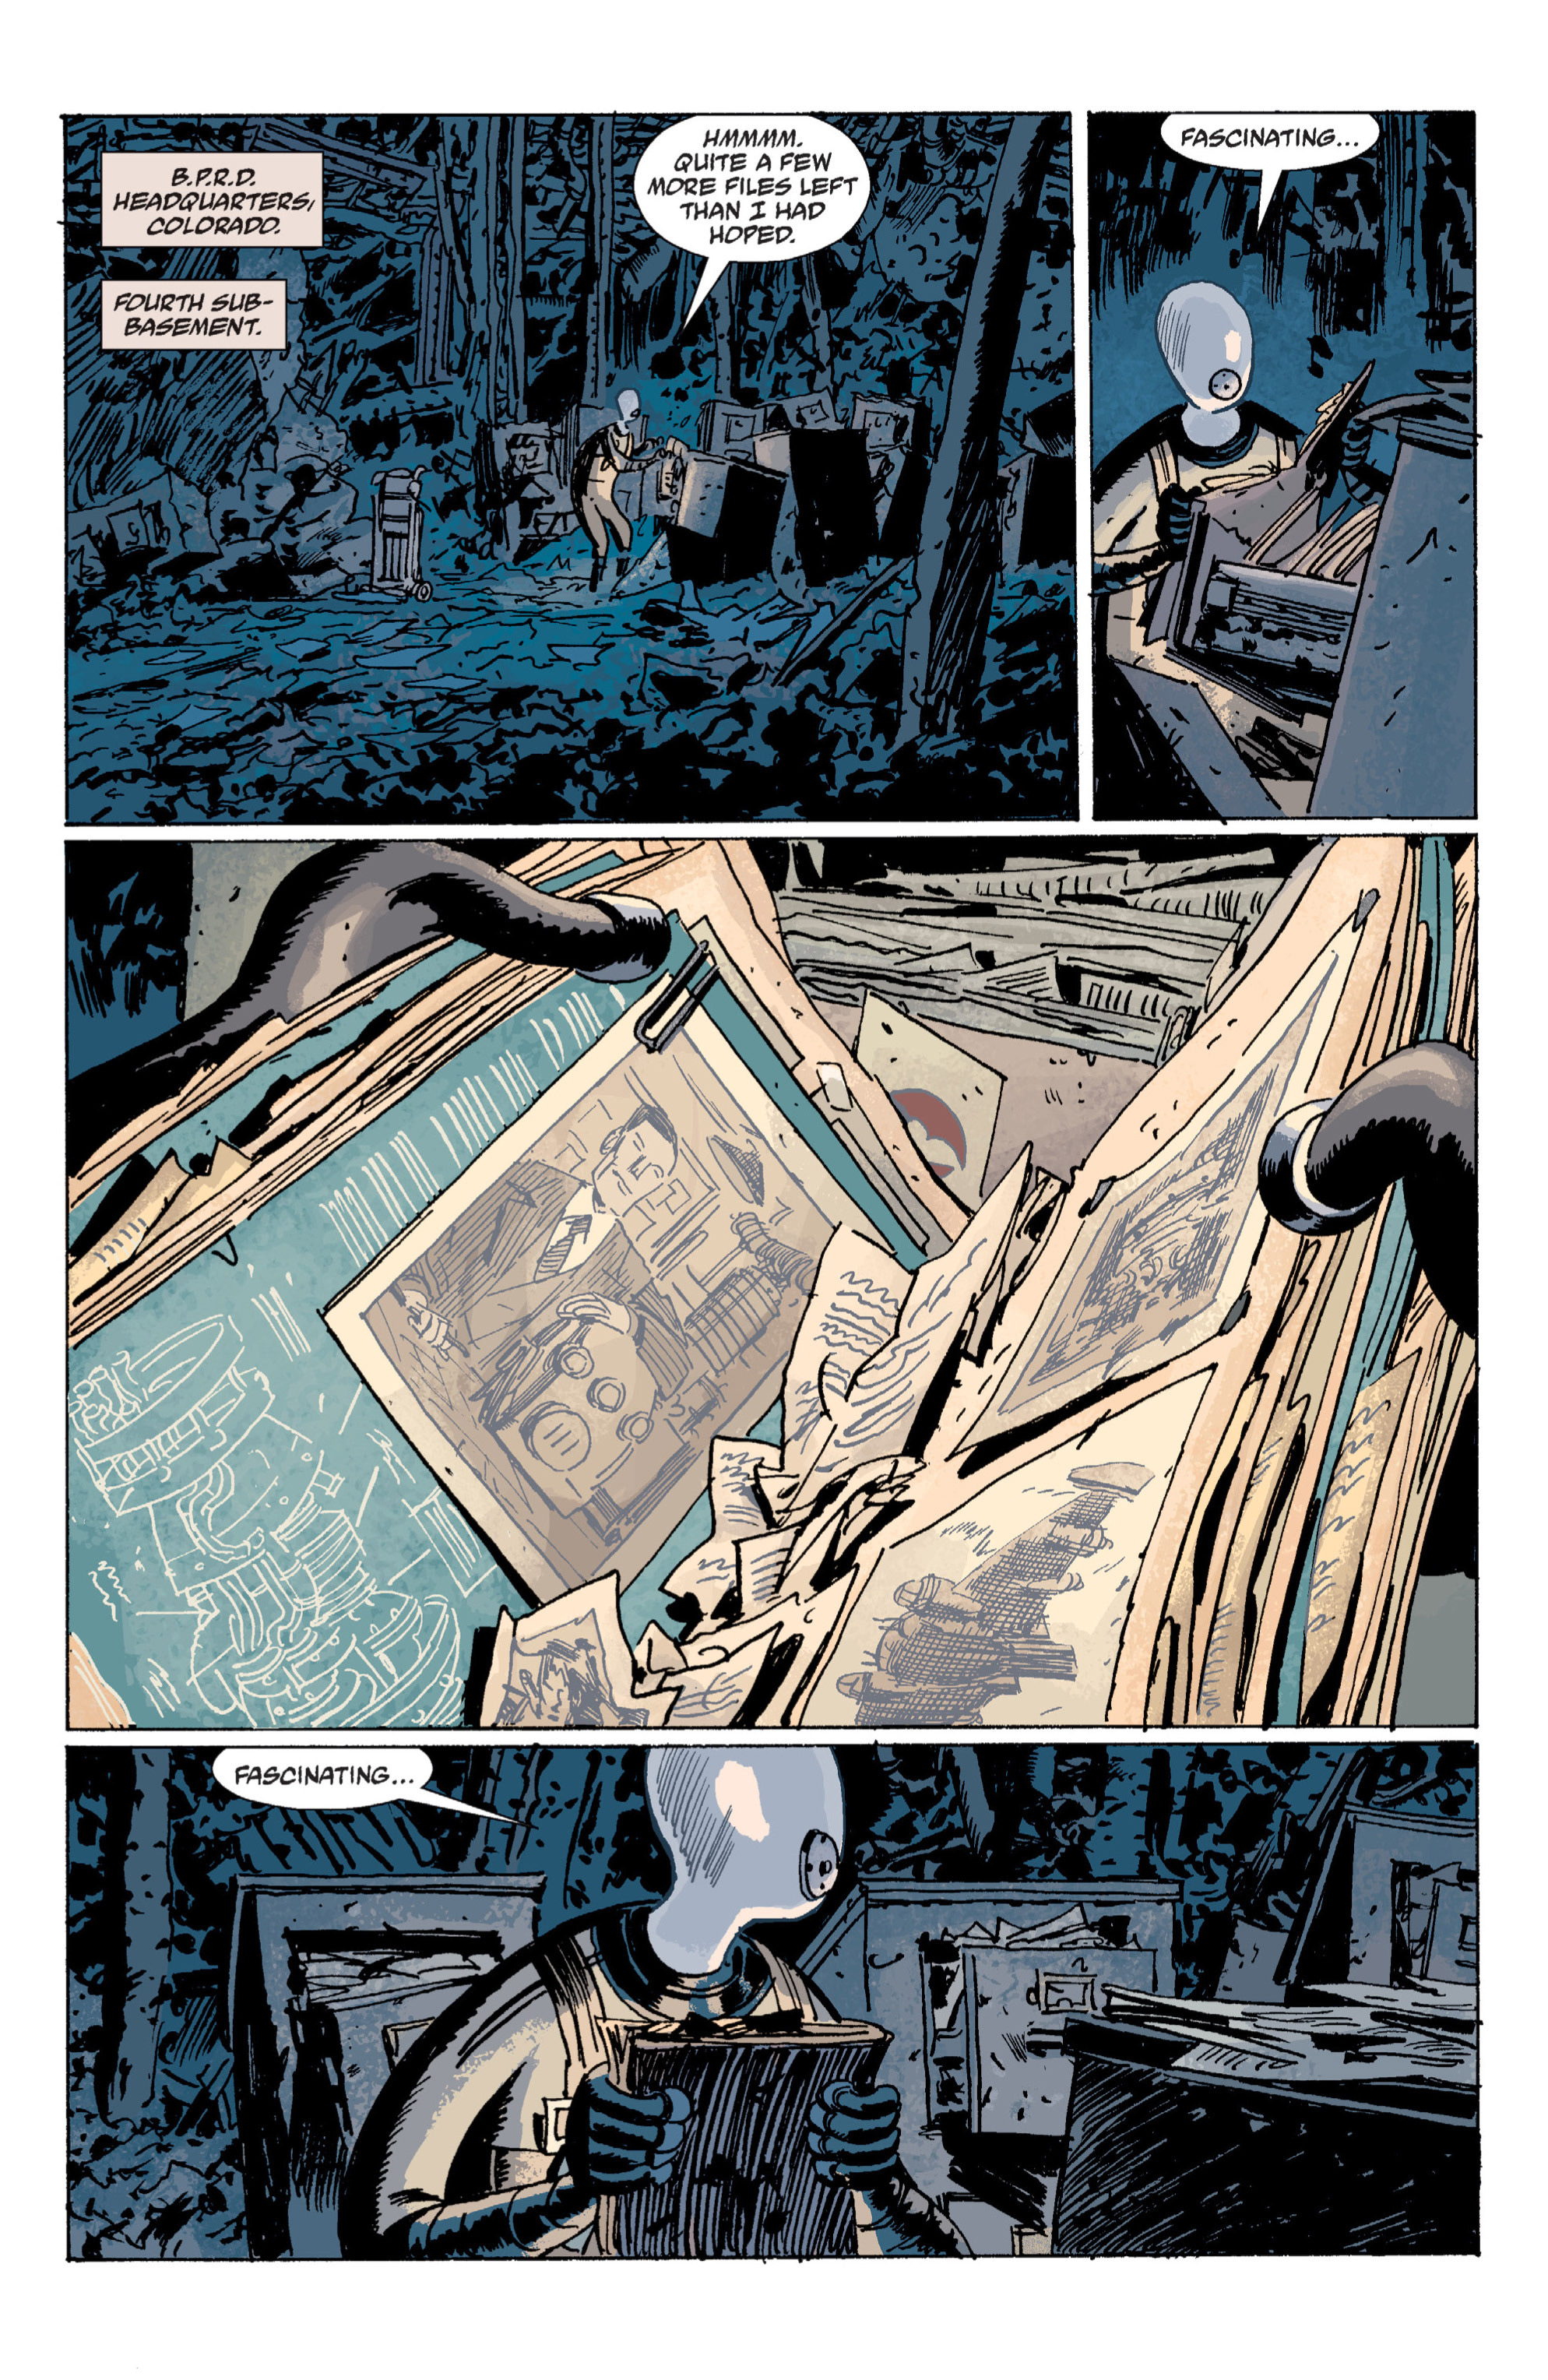 Read online B.P.R.D. (2003) comic -  Issue # TPB 7 - 40